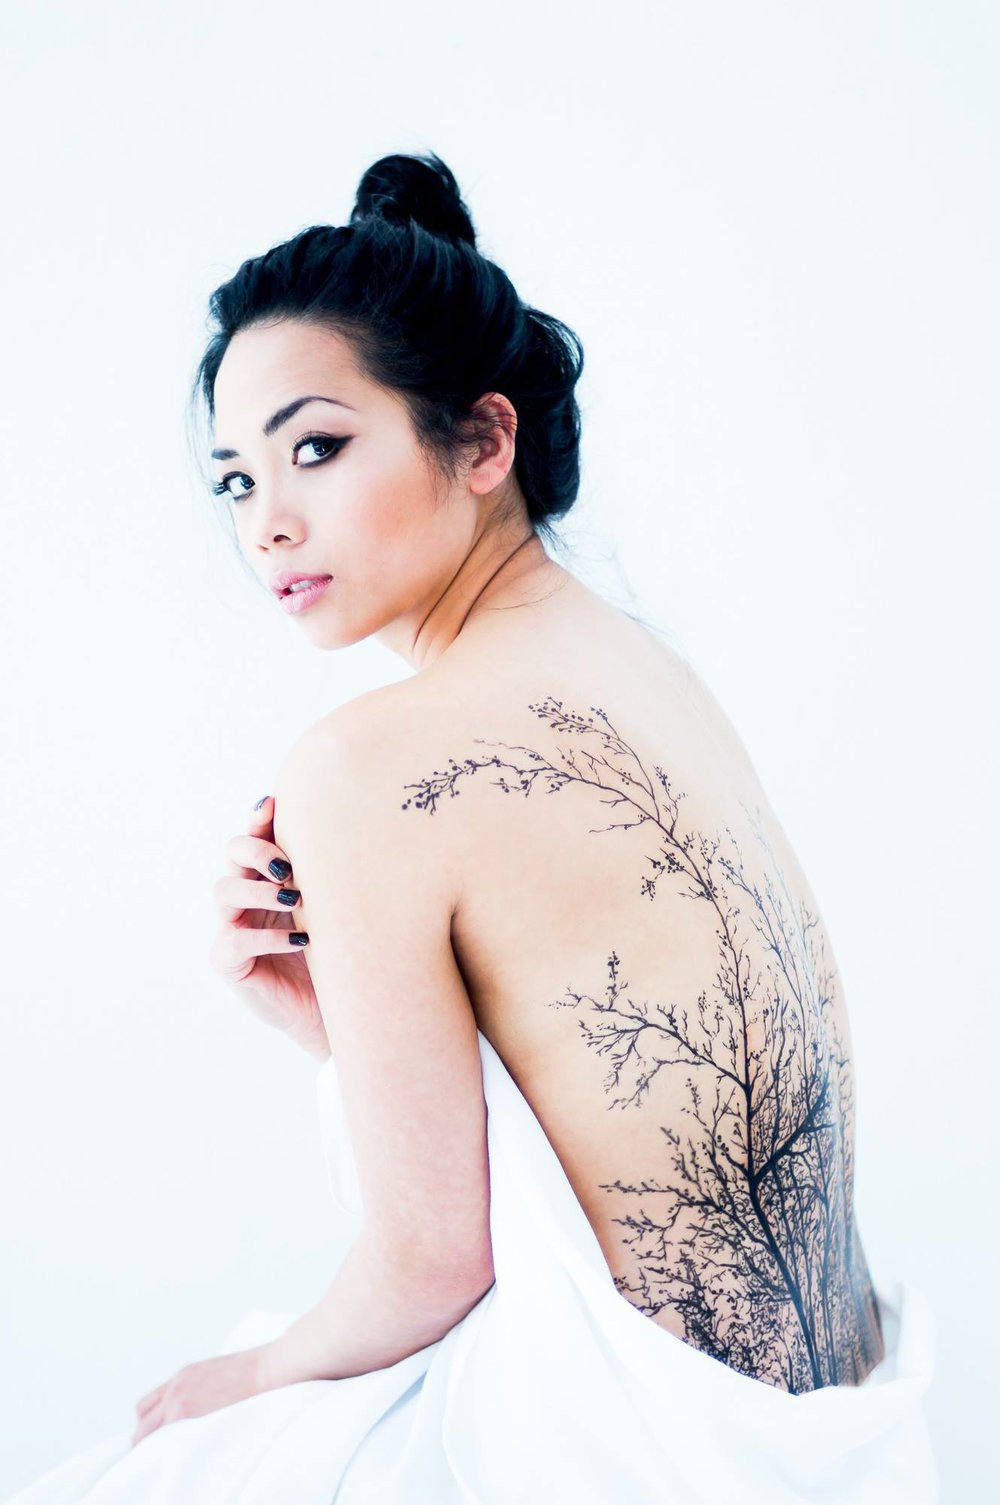 Photography: Sebastien P. photography Model: Christine Christine Jimenez Muñoz Make-up & Manicurist: Elody.R -Make Up Temporary Tattoos: Frederic Carrasco